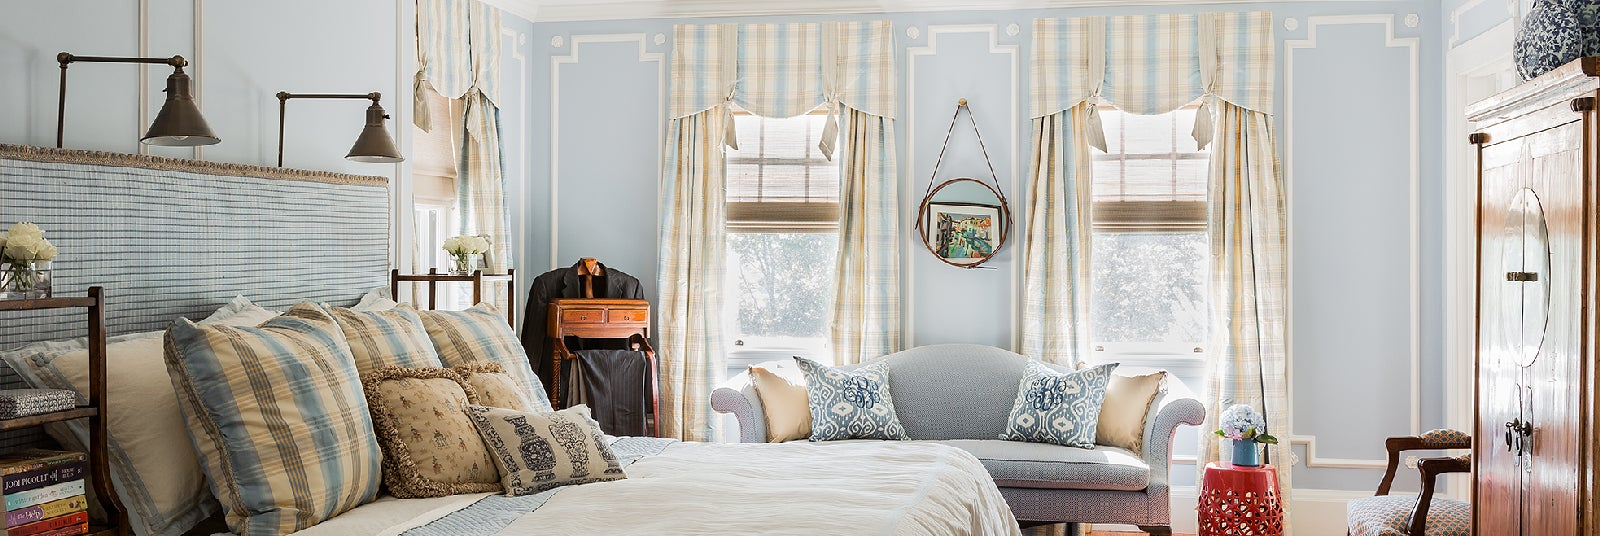 Elizabeth Home Decor & Design, Inc. Collection - For Sale | Chairish